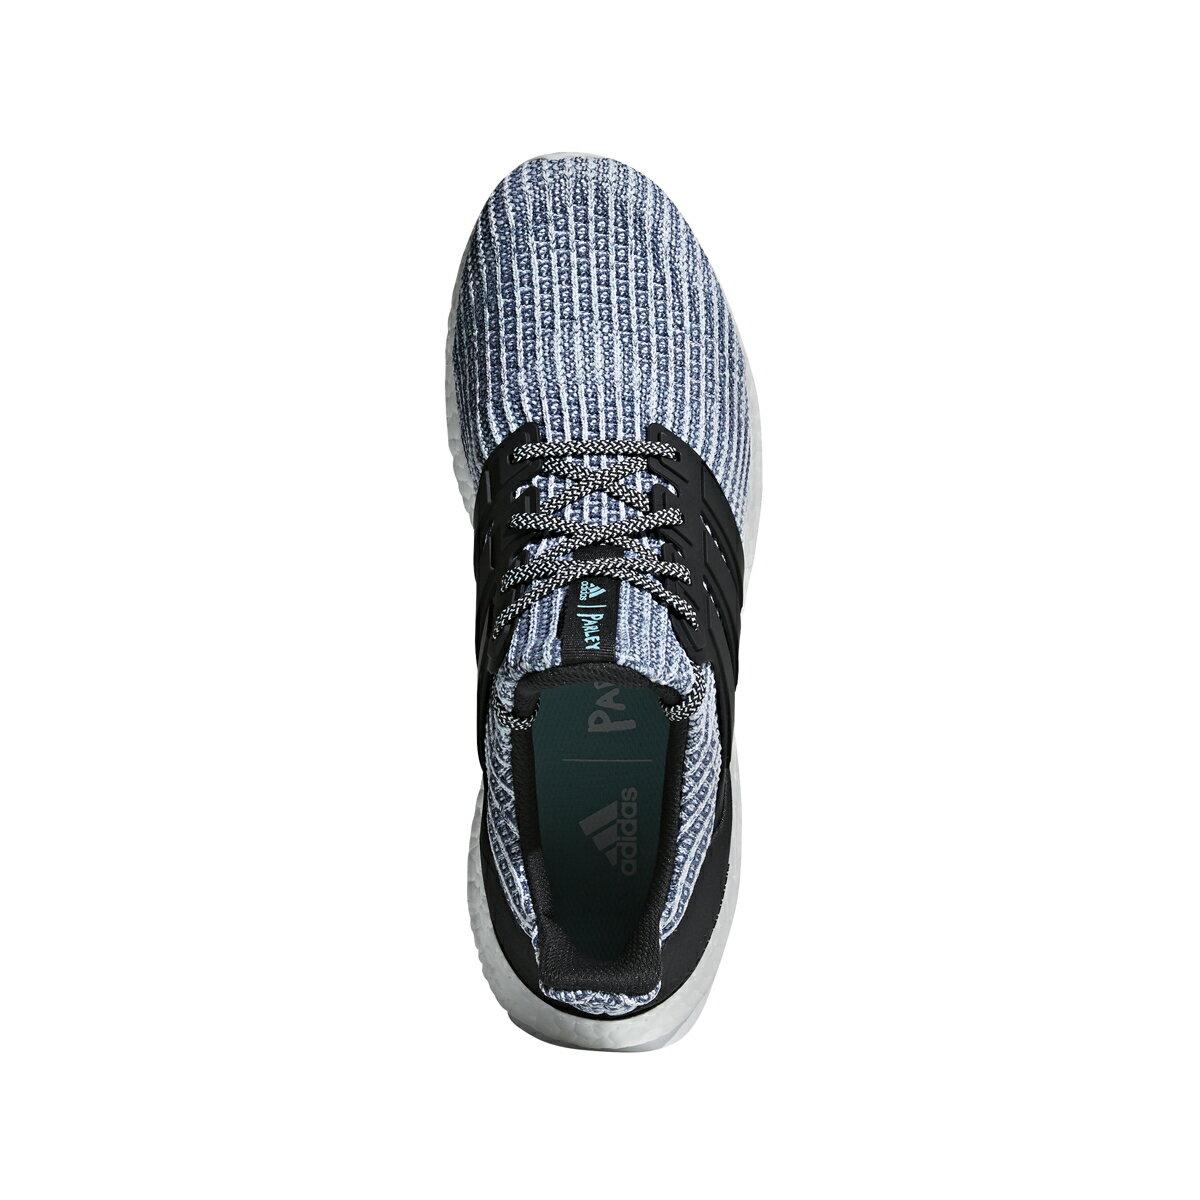 857dc2c33 RU Products  adidas UltraBOOST Parley 4.0 Shoe - Men s Running SKU ...